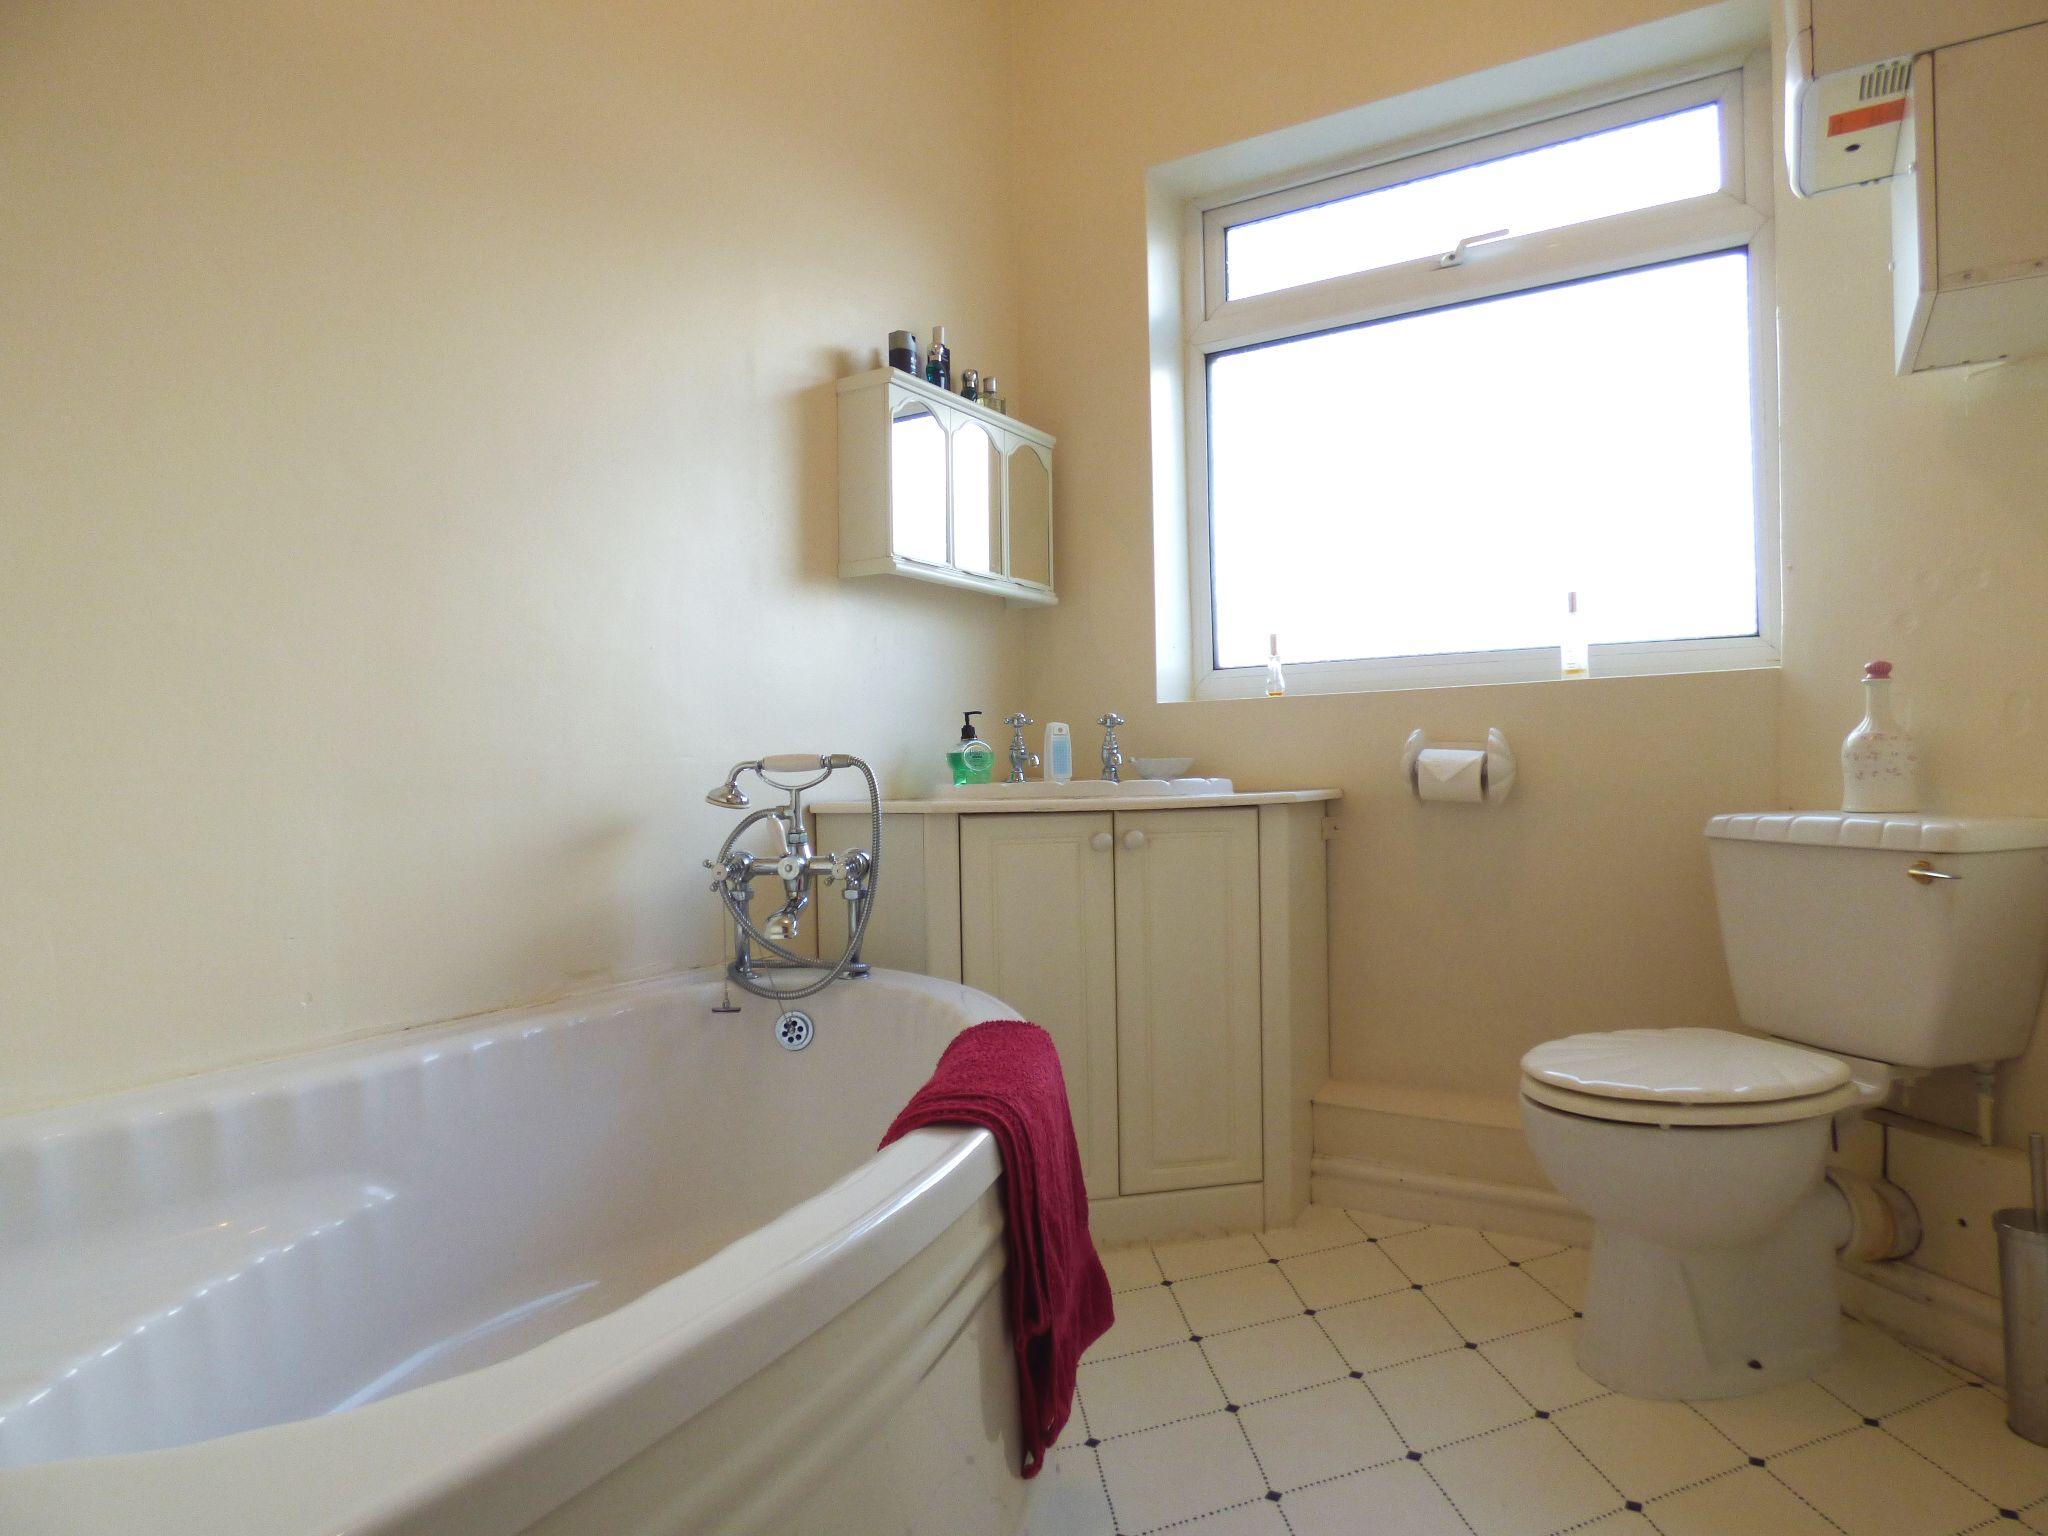 2 Bedroom Mid Terraced House For Sale - Bathroom